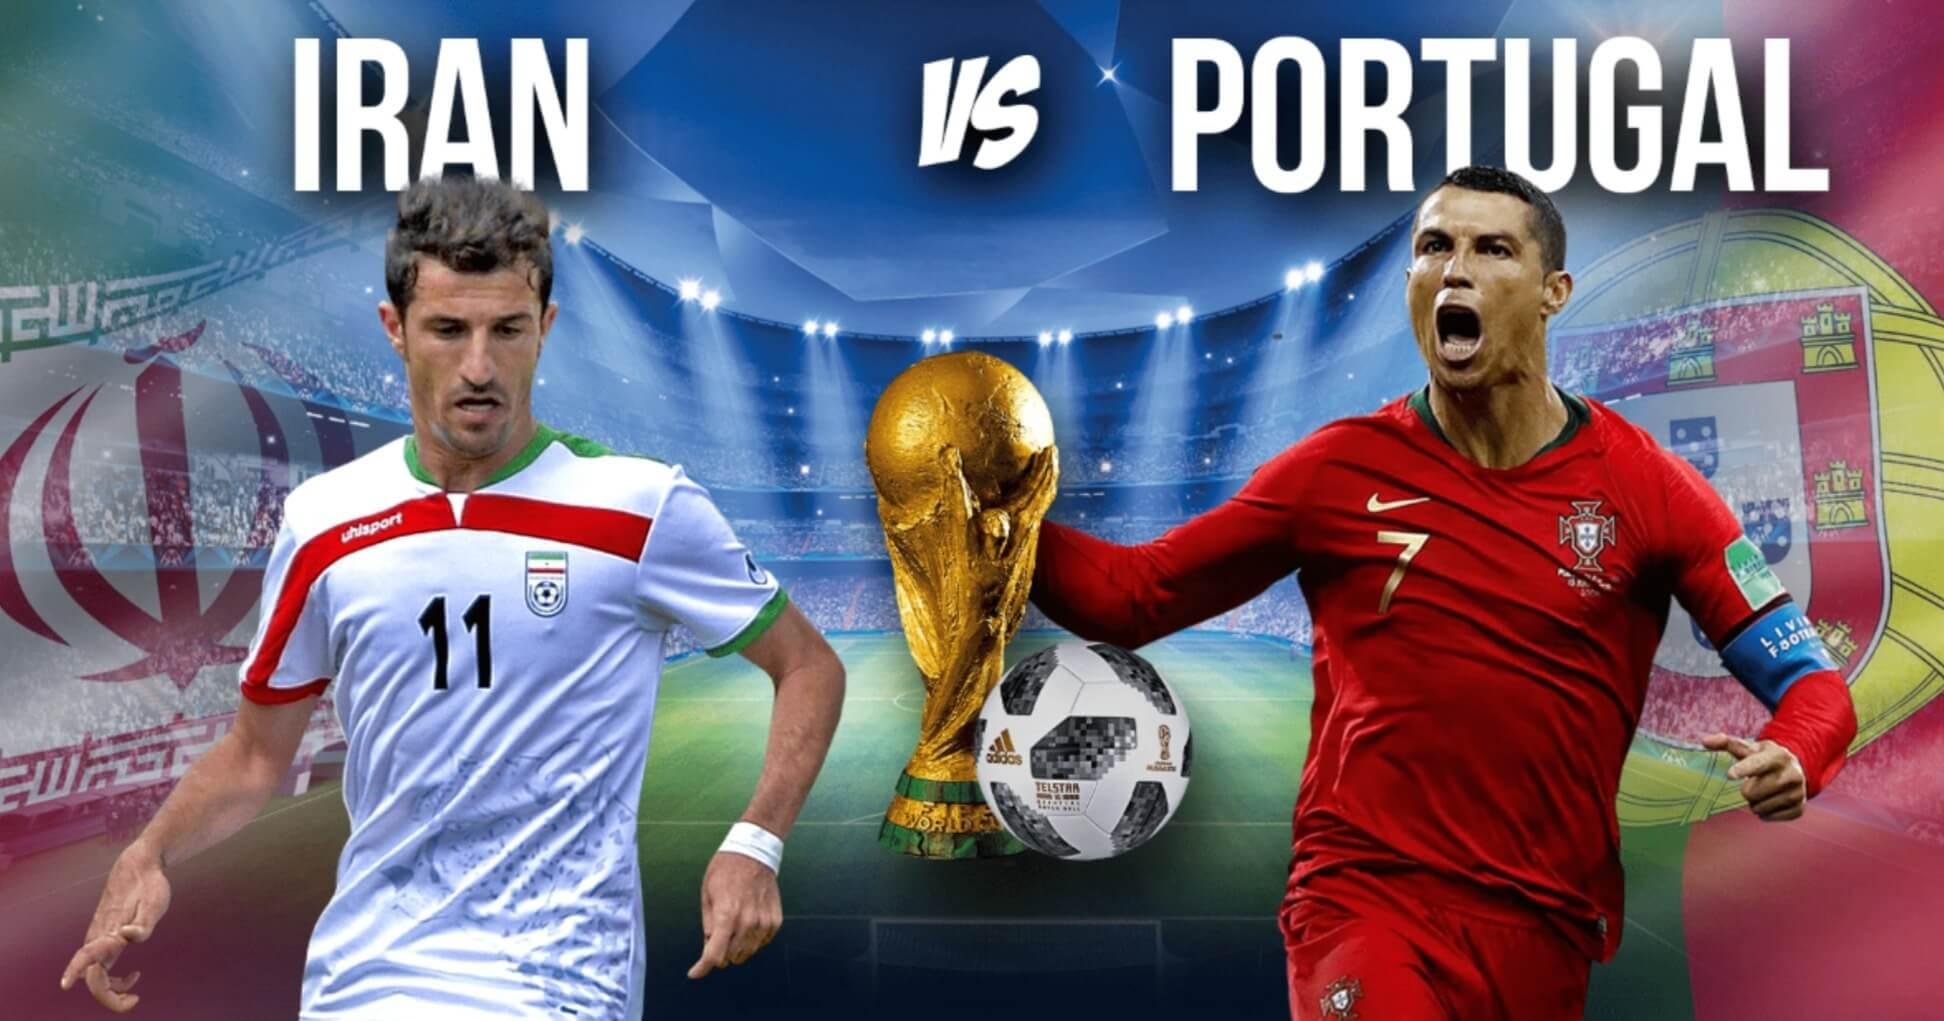 बुहुम काप 2018: ईरान आरो पुर्तगाला 1-1 फिथाय मोनो